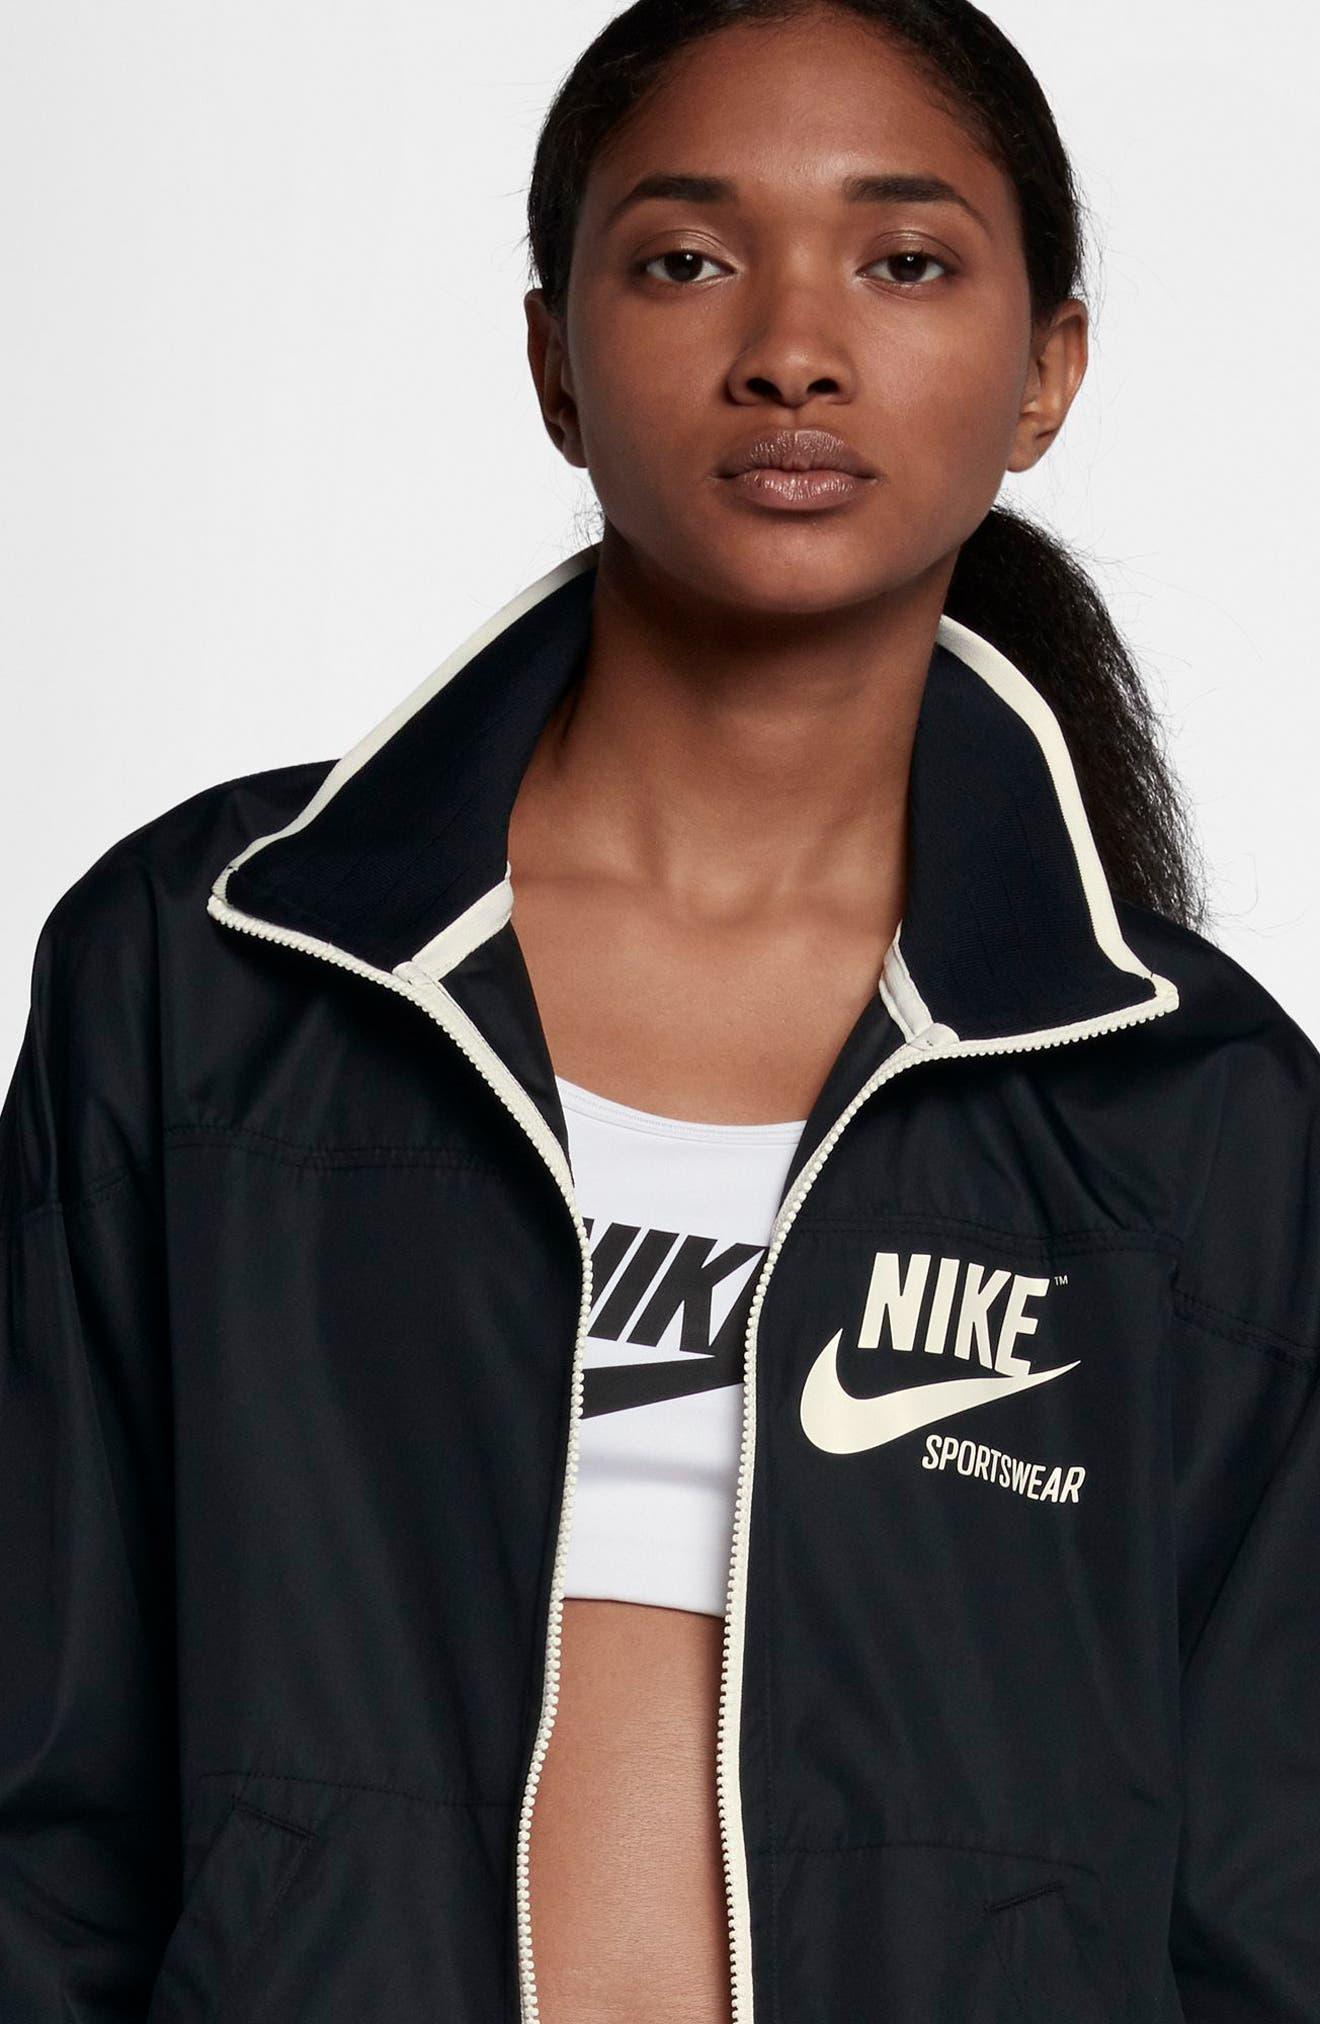 Sportswear Archive Jacket,                             Alternate thumbnail 7, color,                             010